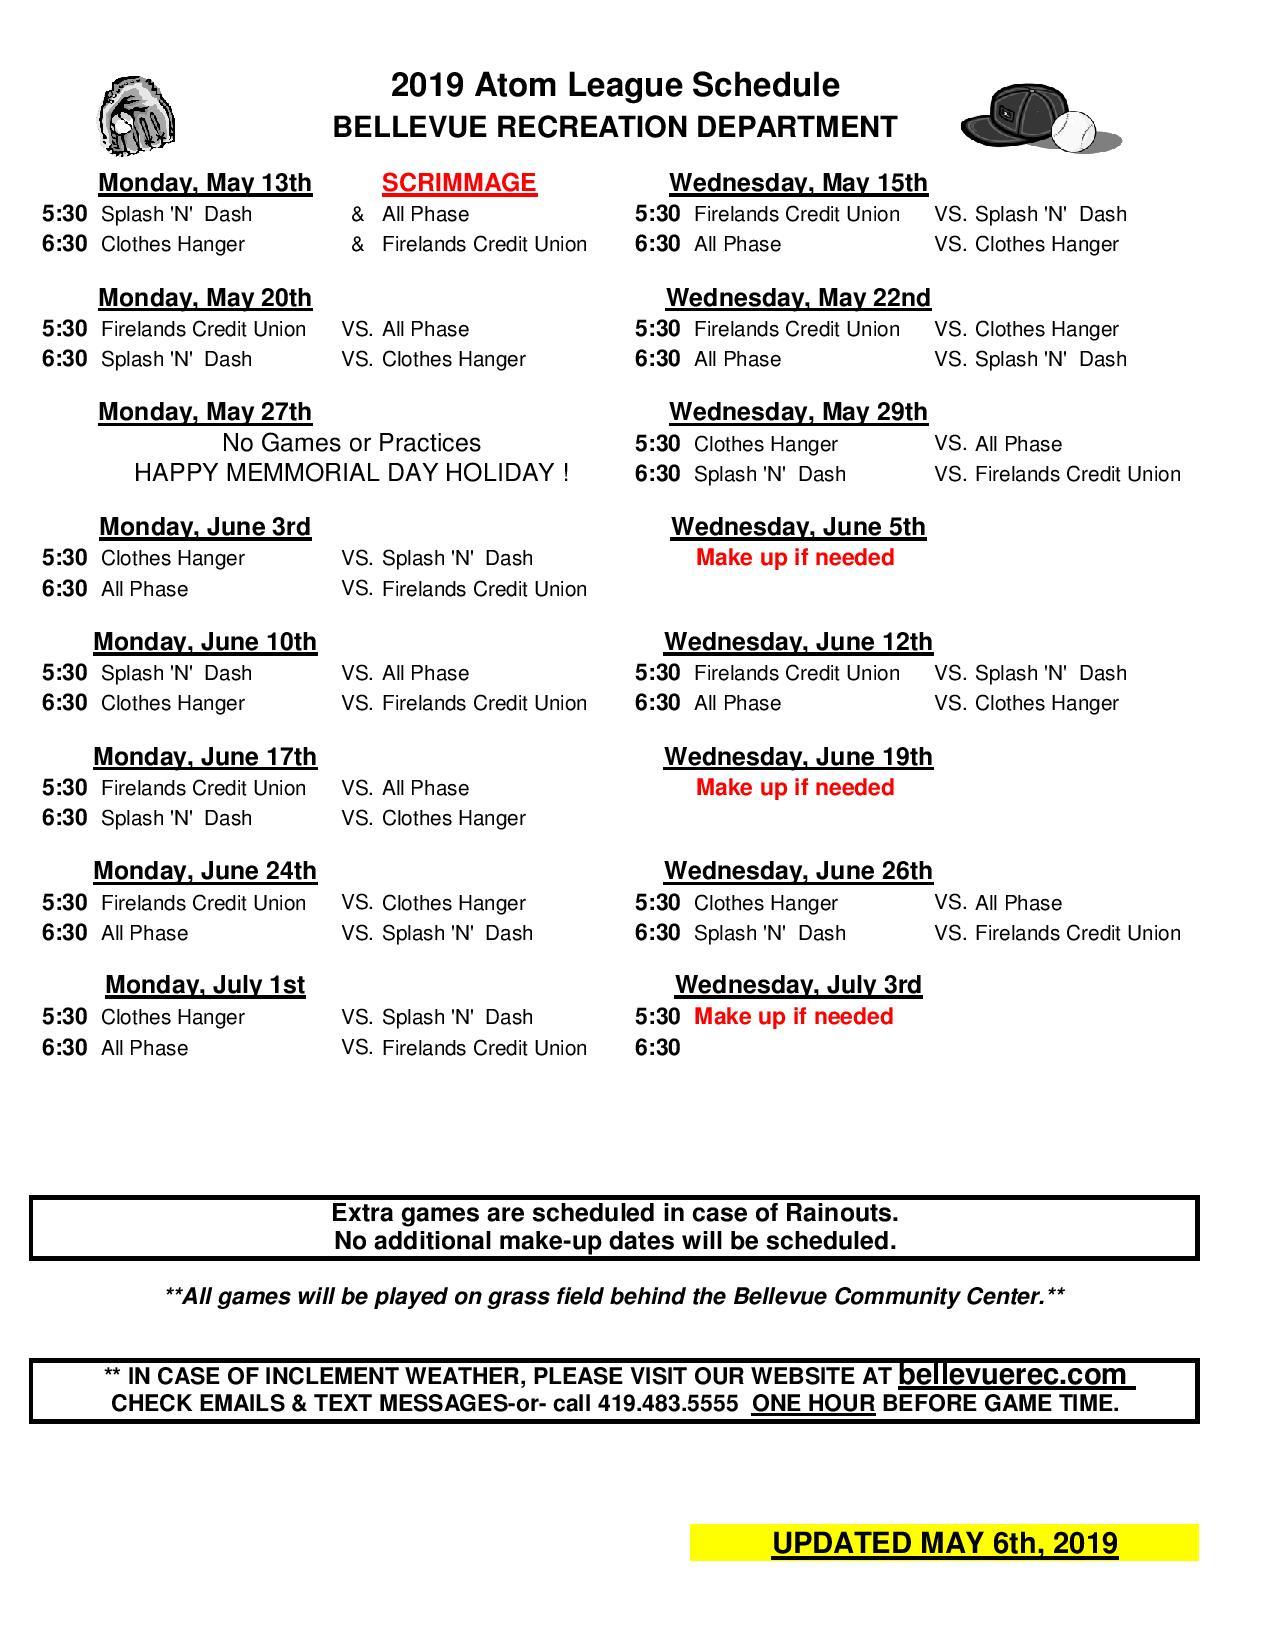 2019 Atom Lg schedule-kip-page-001.jpg